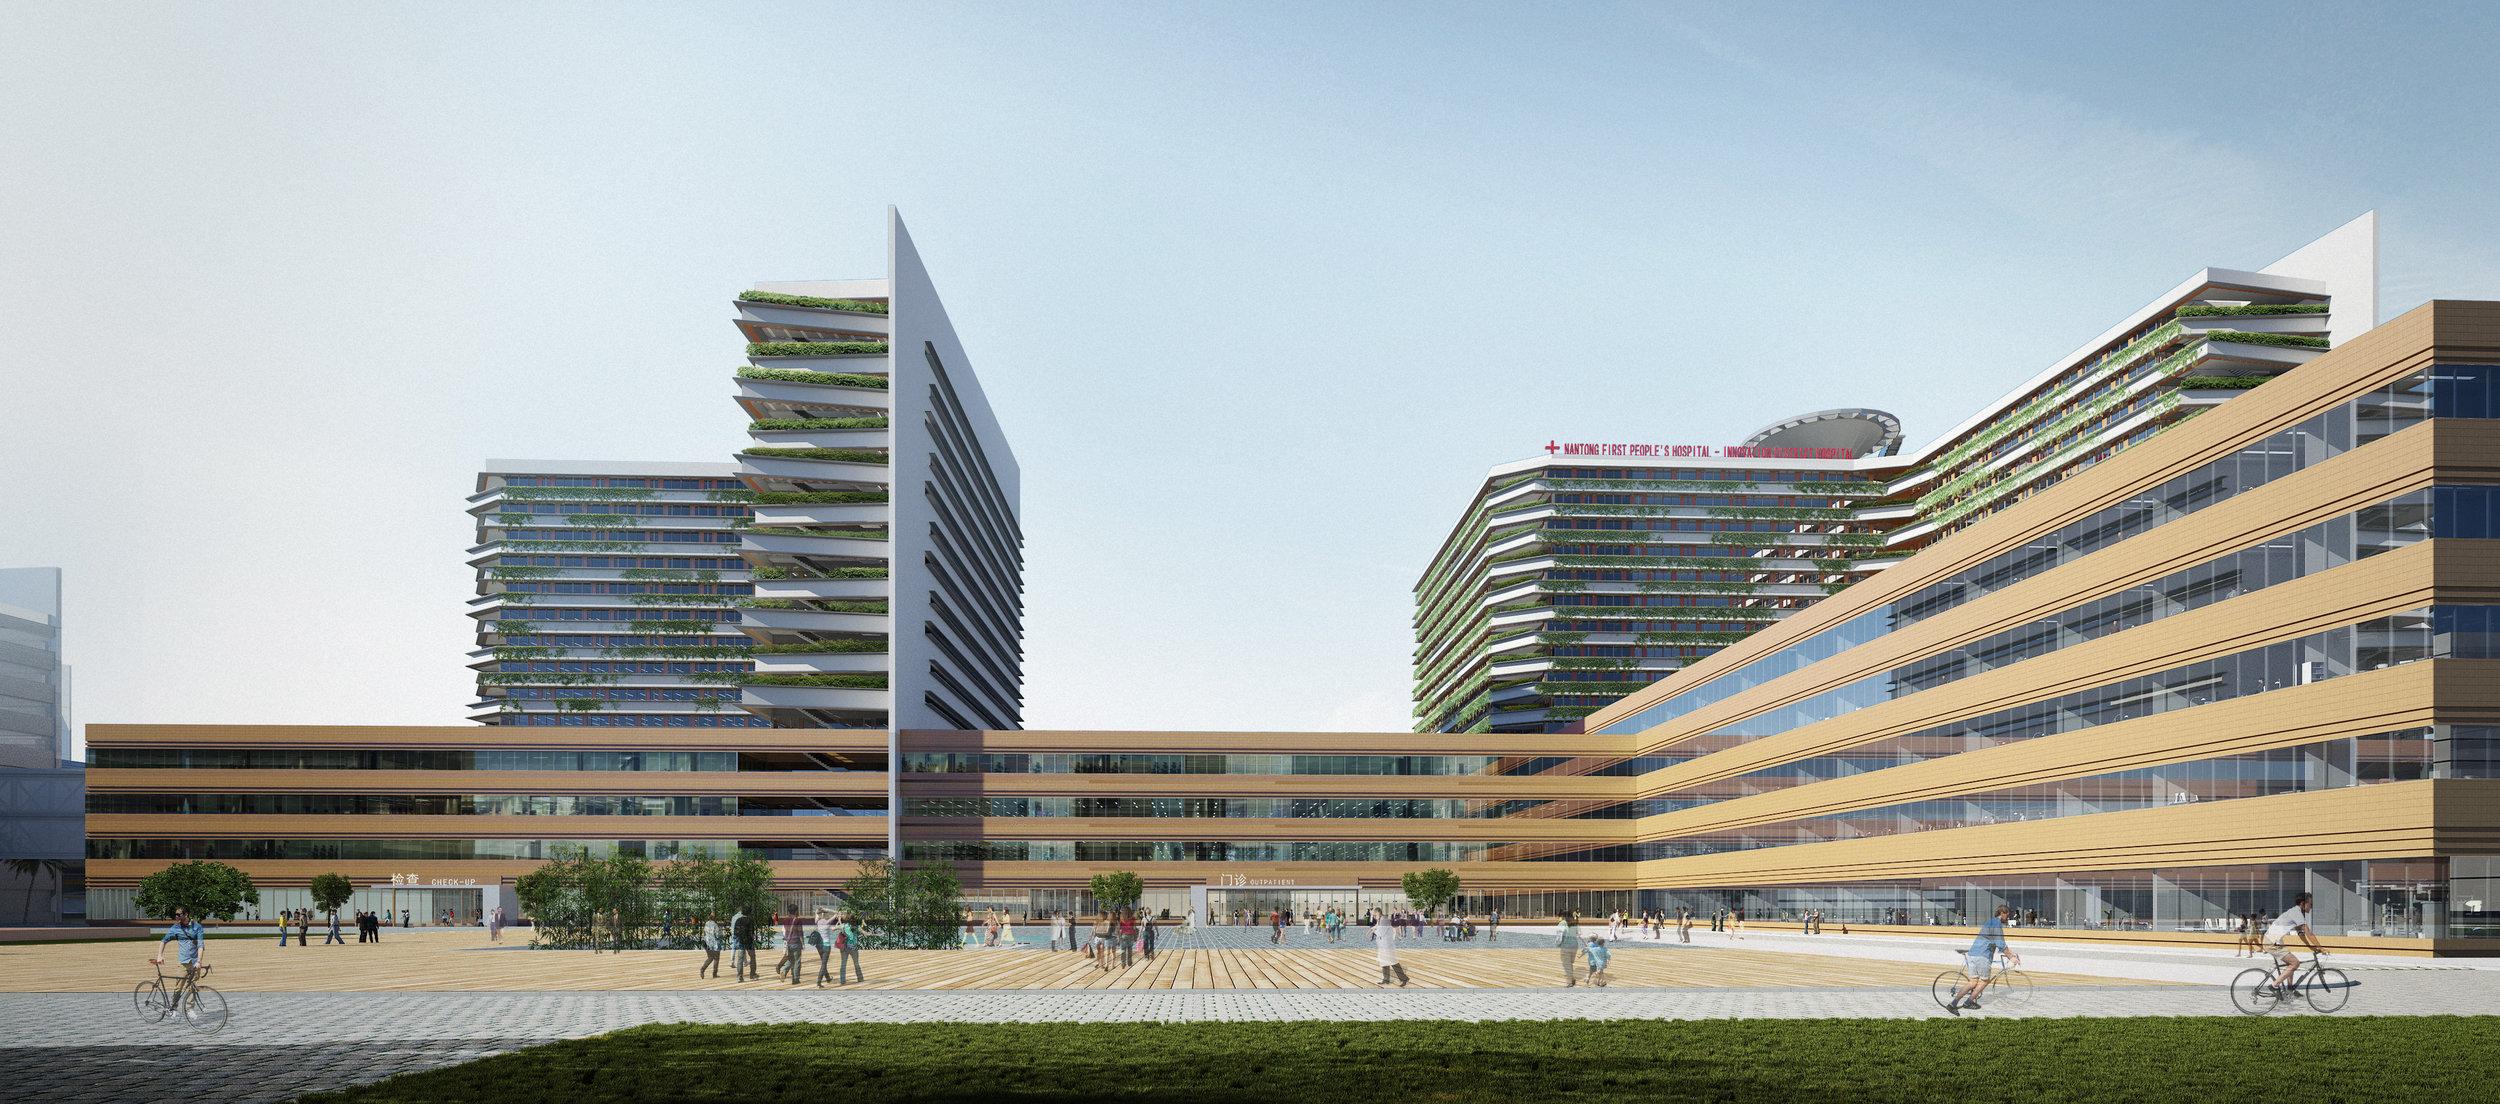 Nantong Central Innovation District Medical Center and Class III General Hospital  nantong, china